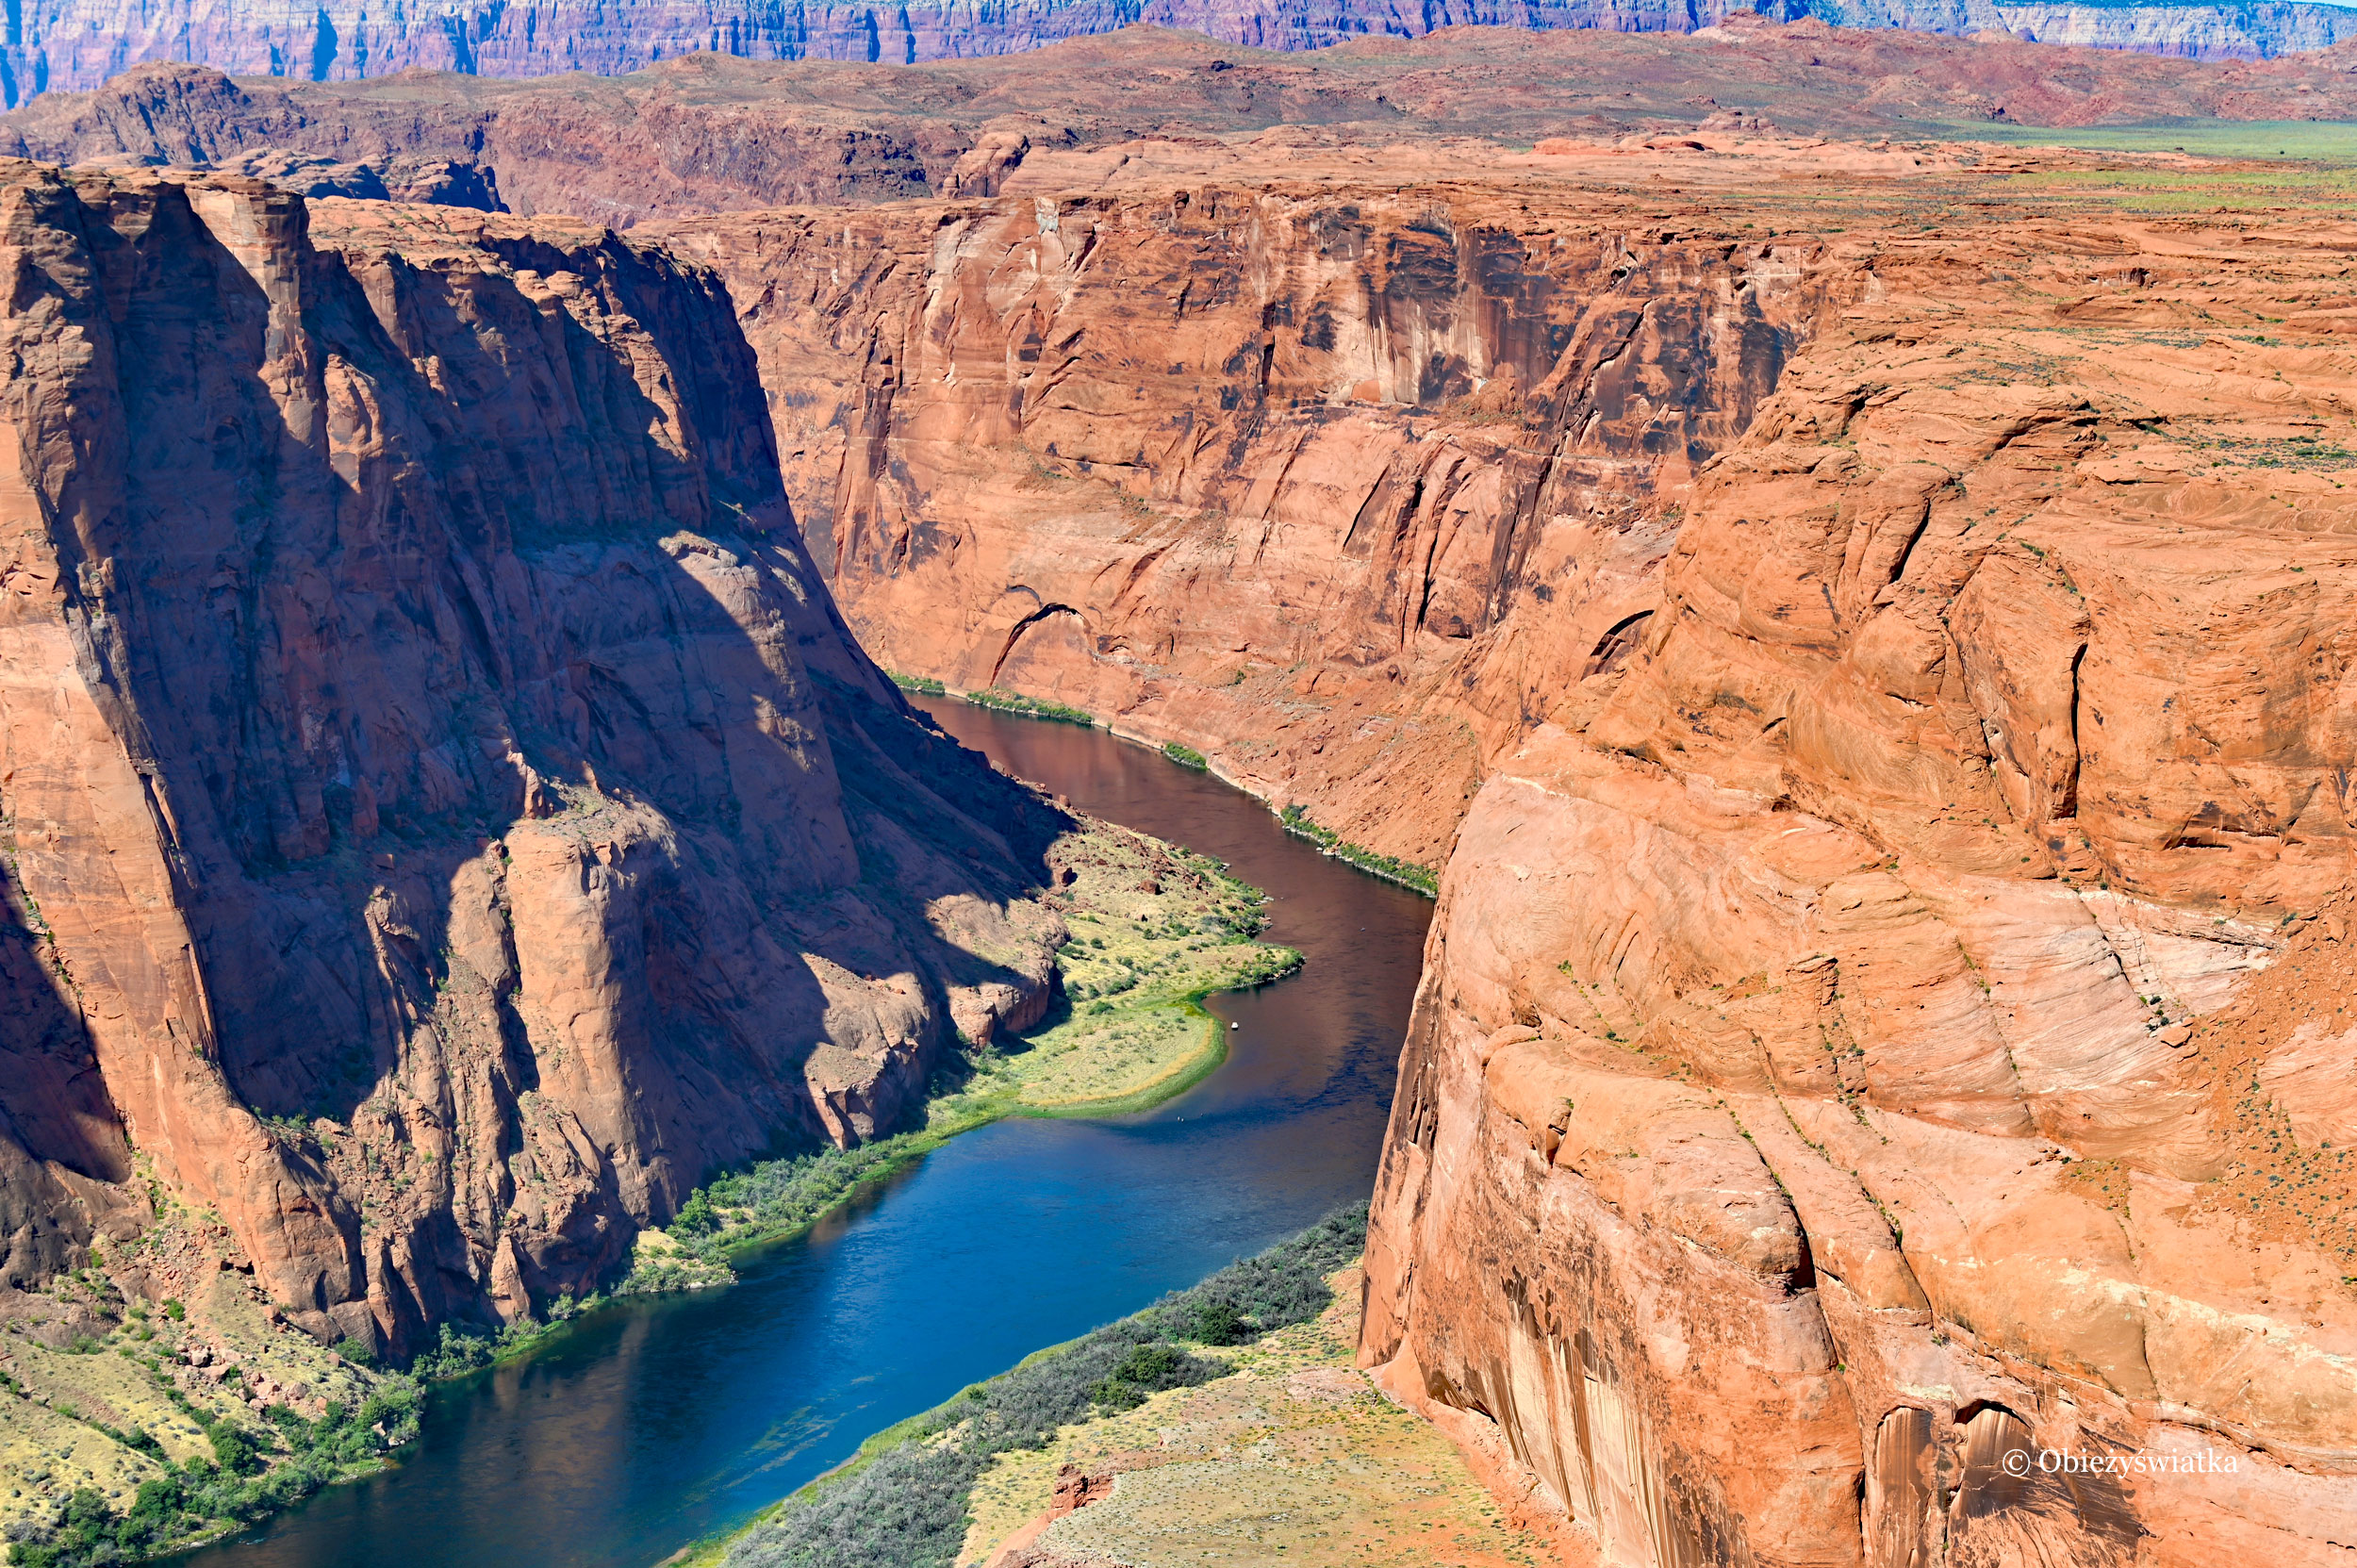 Rzeka Kolorado, Kanion Glen, Arizona